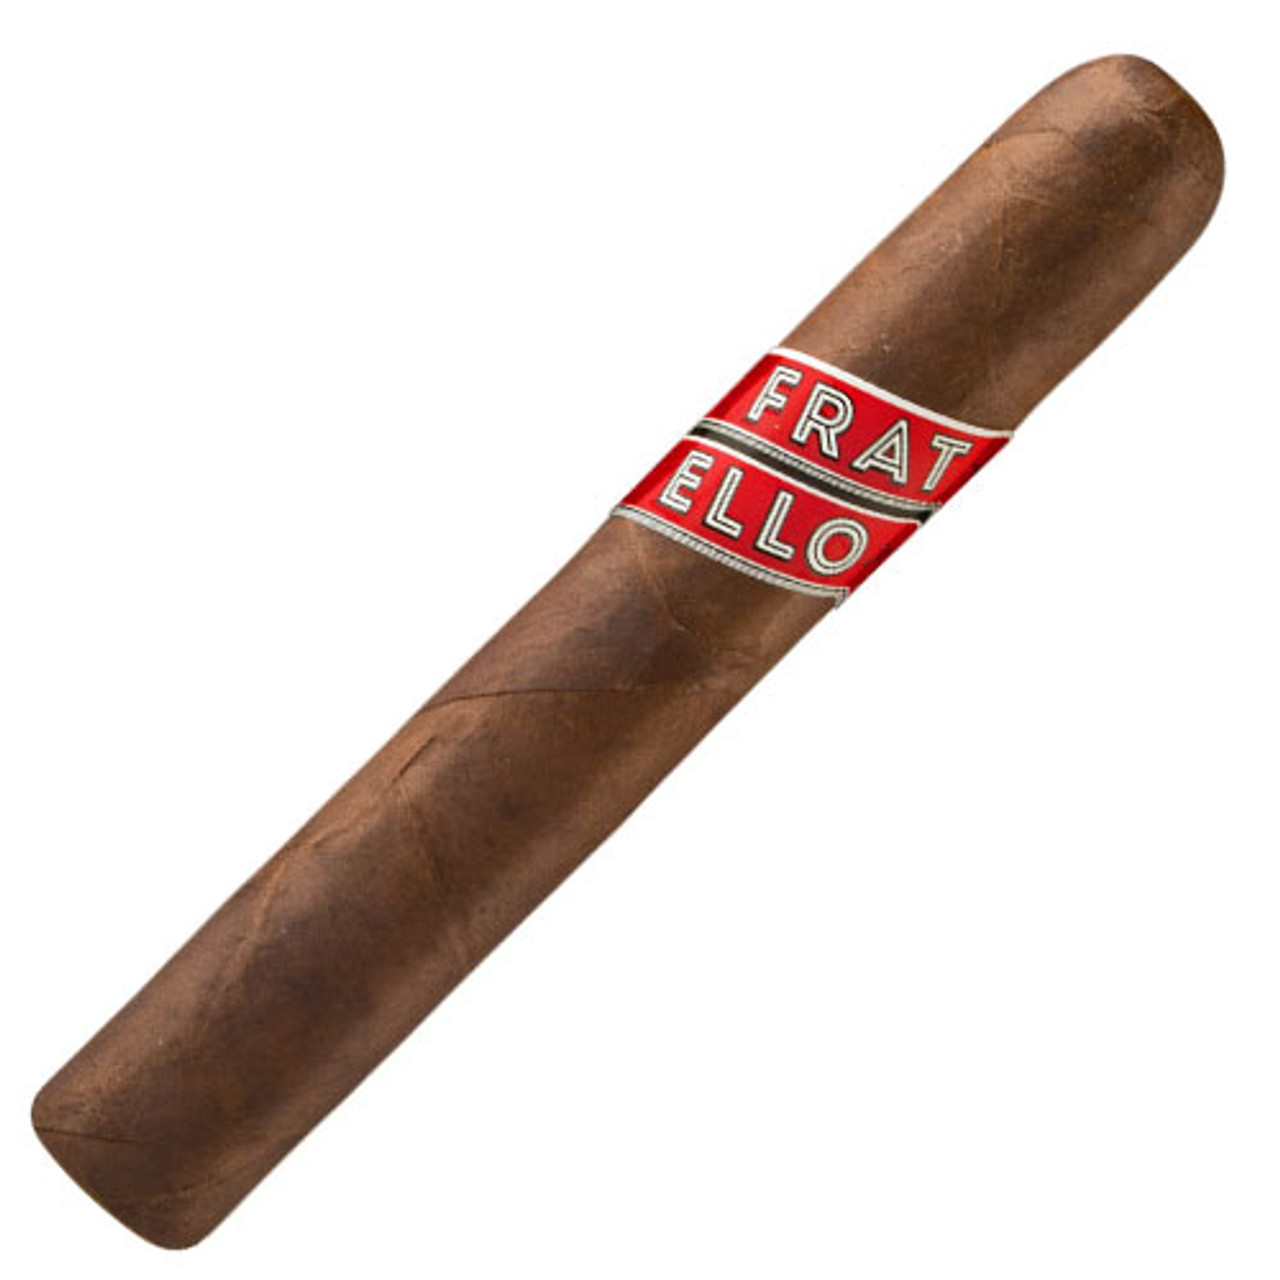 Fratello Robusto Cigars - 5.5 x 52 (Box of 20)